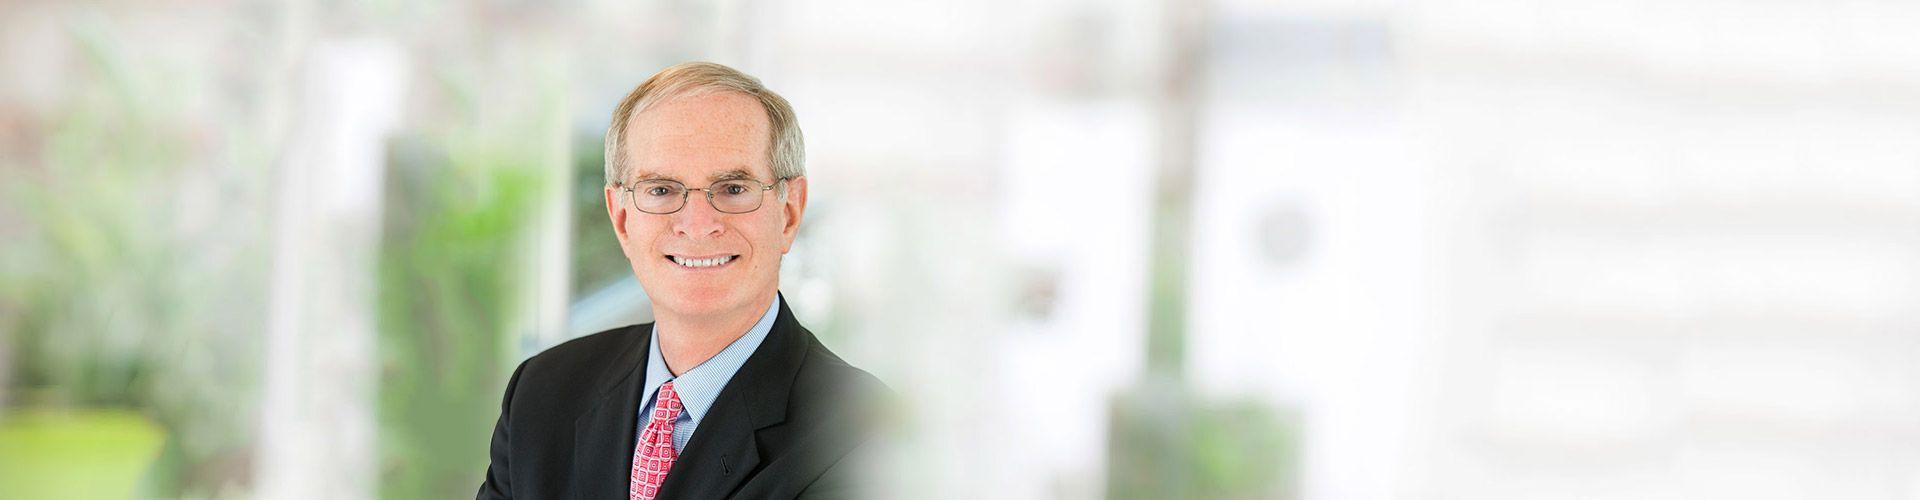 Dr. David J. Kiener